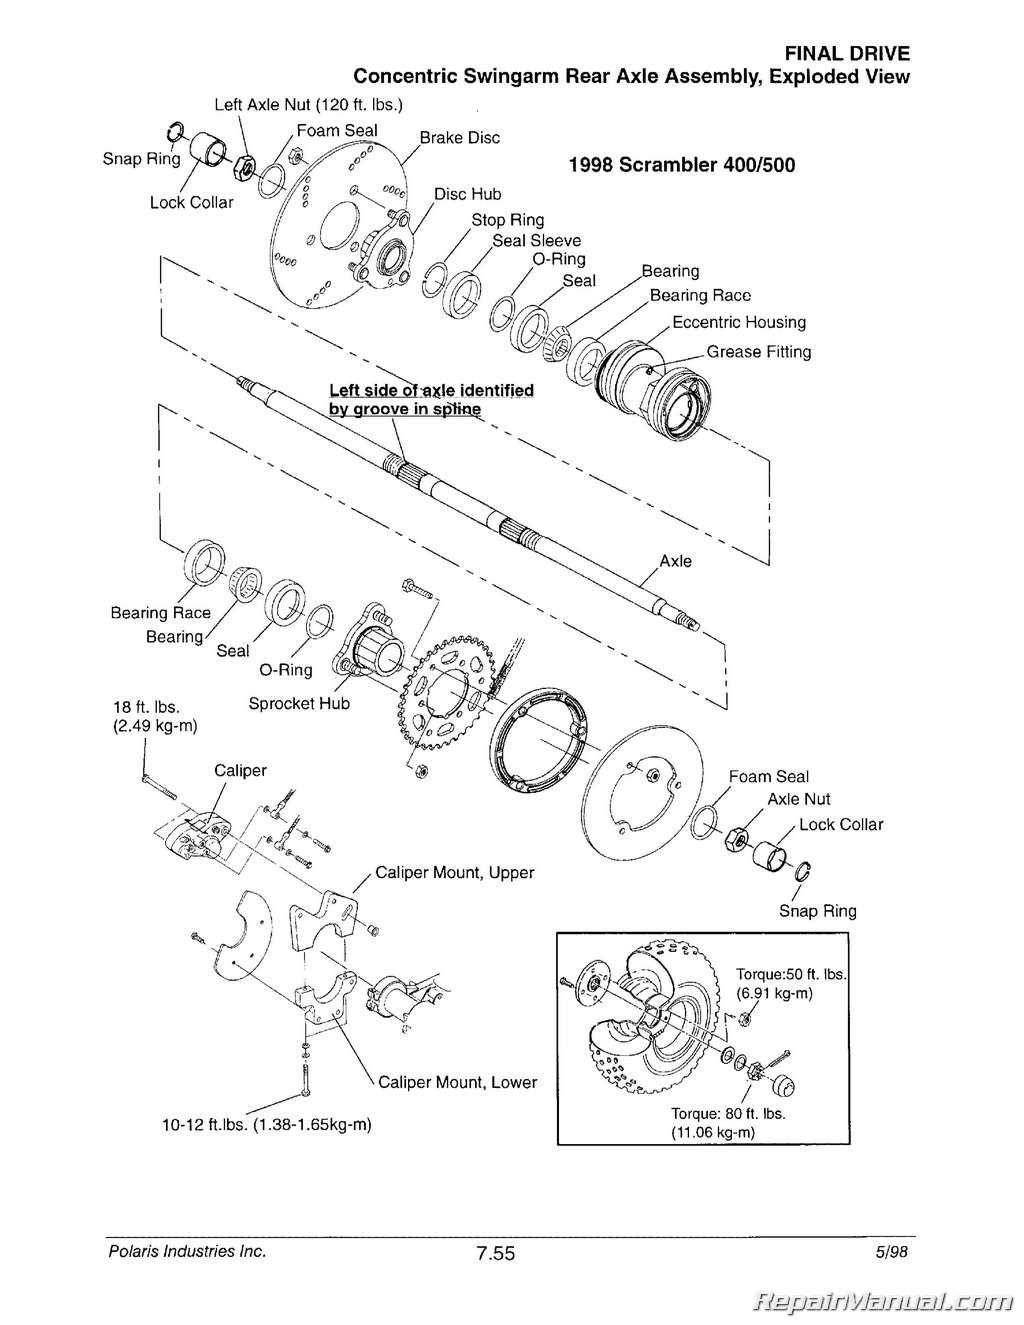 fuse box on polaris atv online wiring diagram